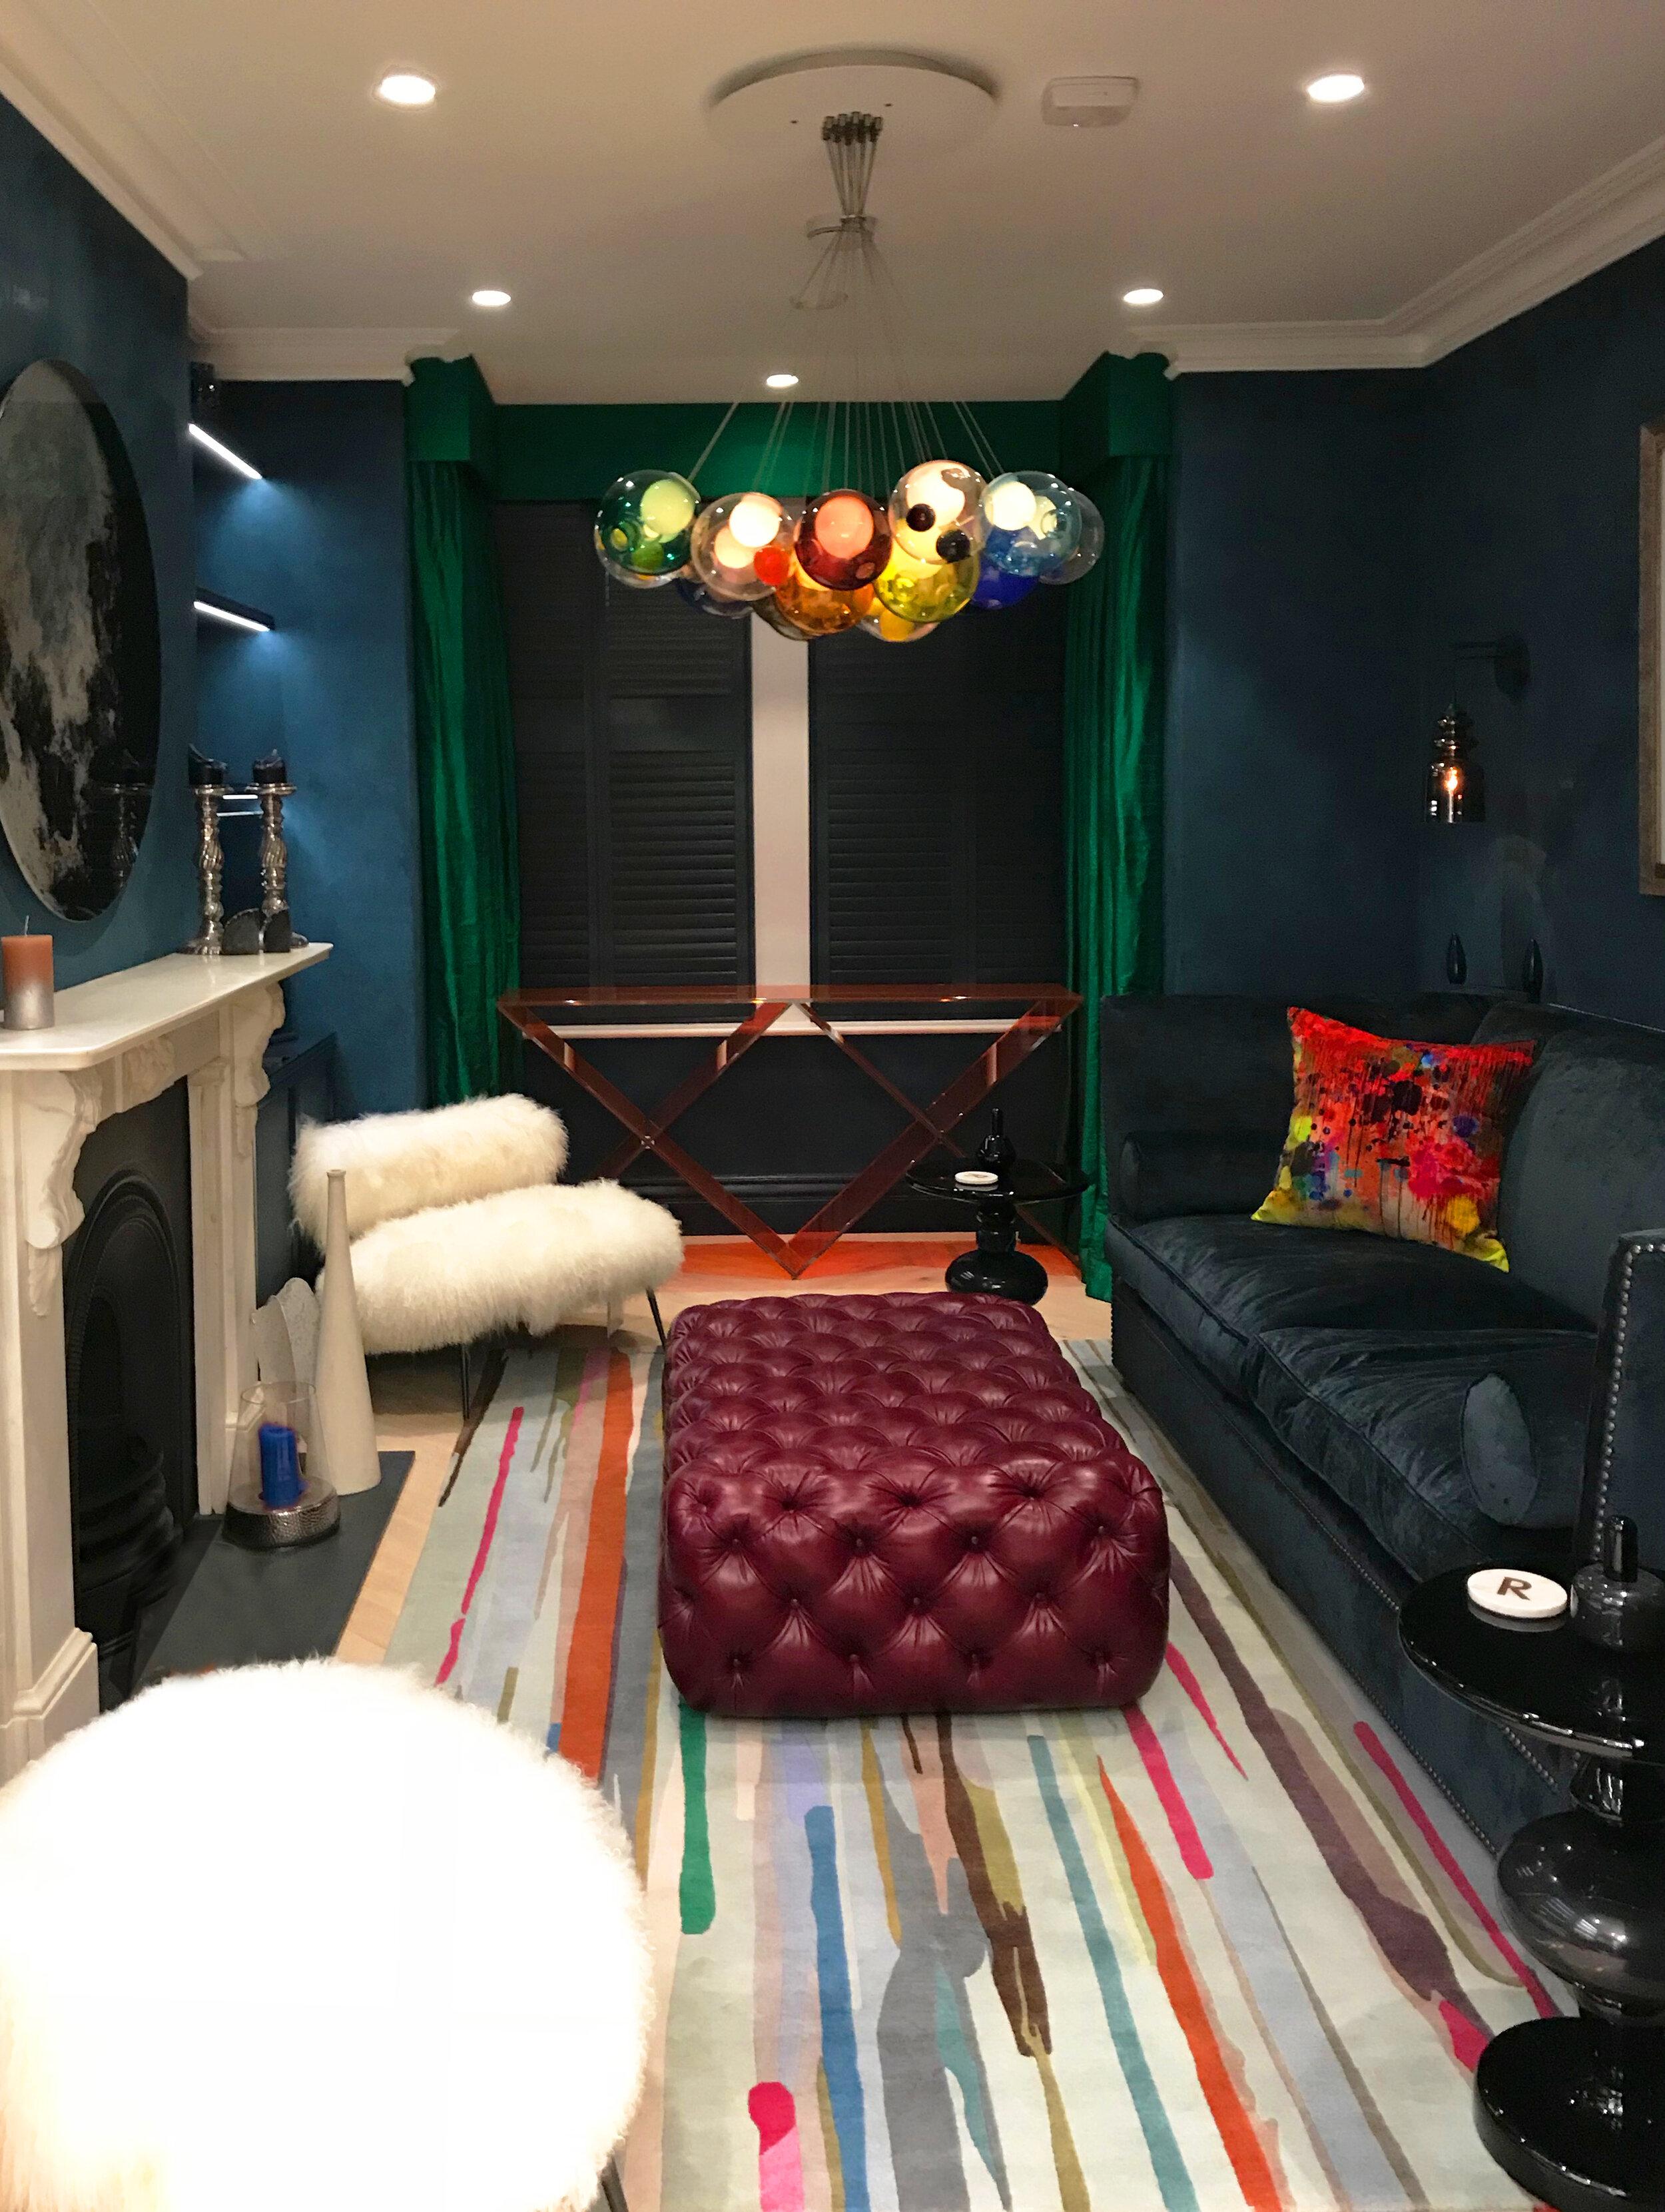 lottacoledesign-frontroom.jpg